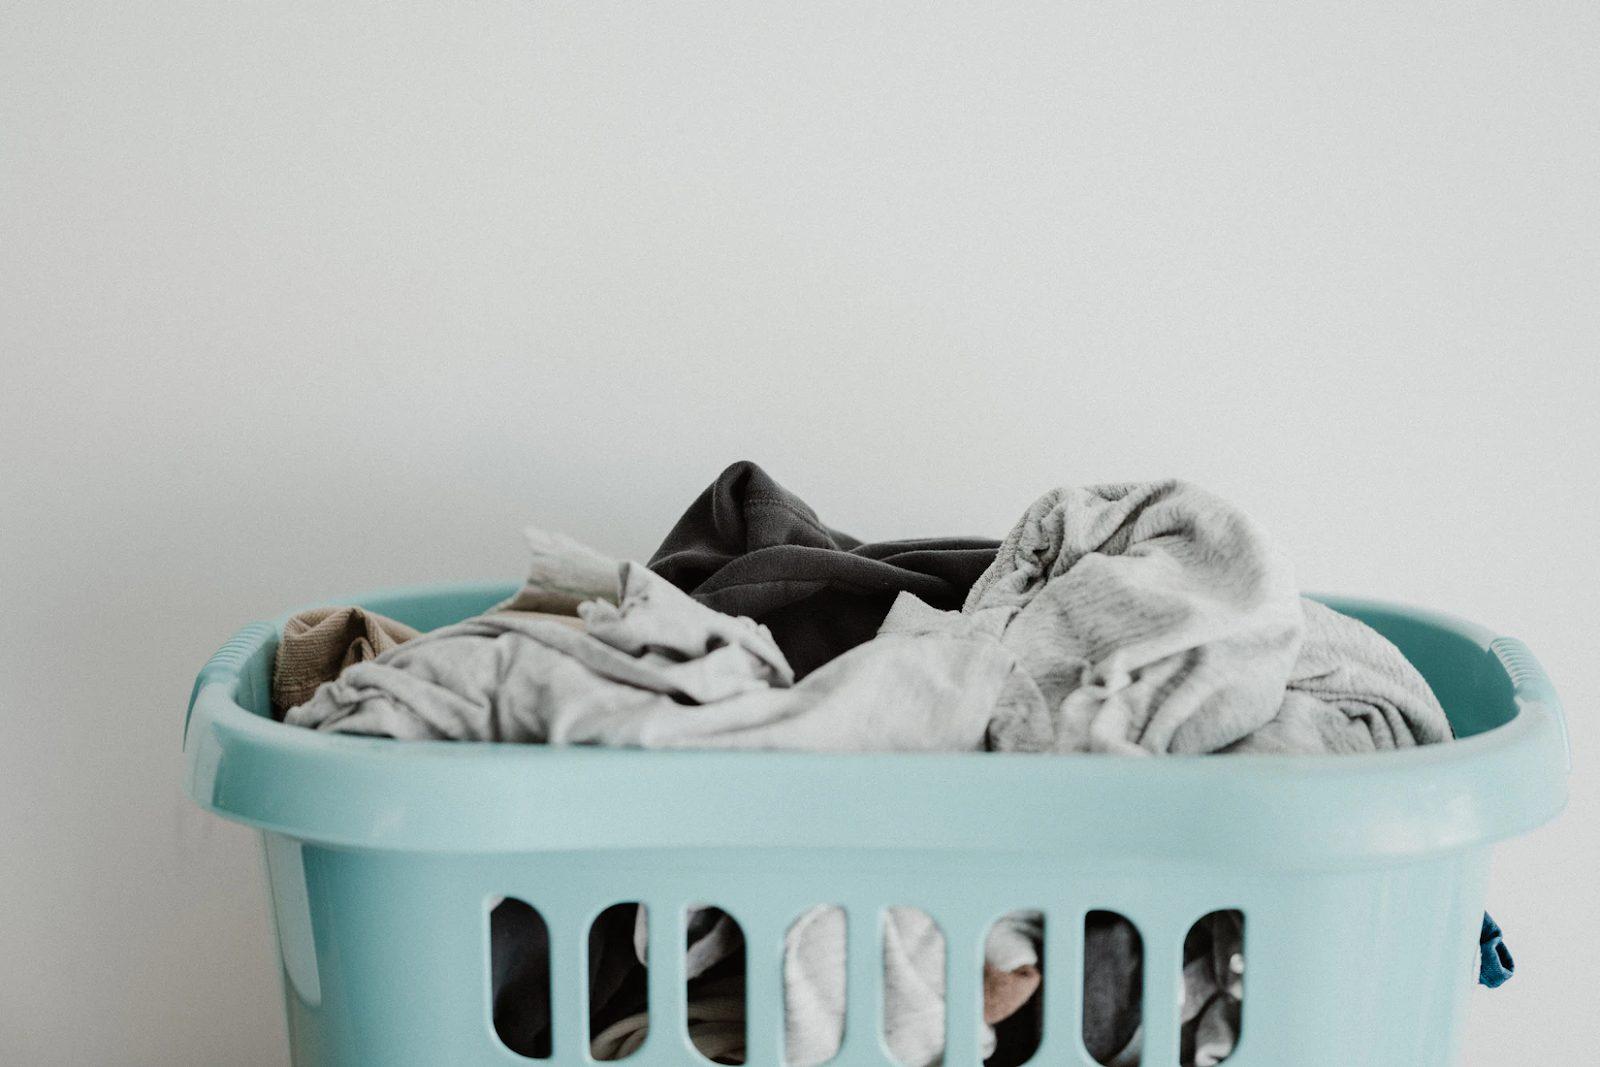 10 Common Laundry Mistakes